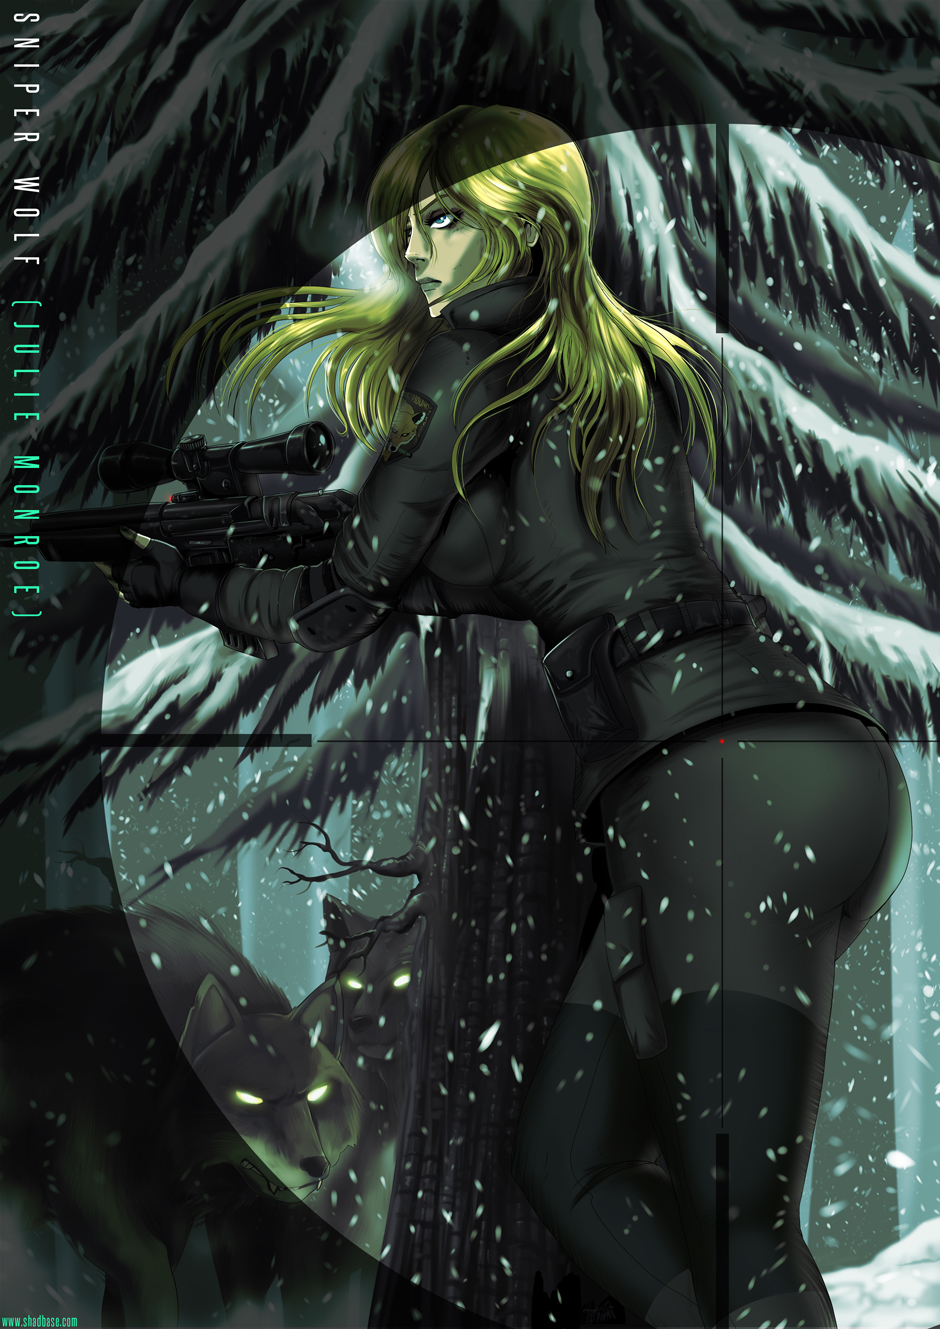 Girls of MetalGear Sniper Wolf